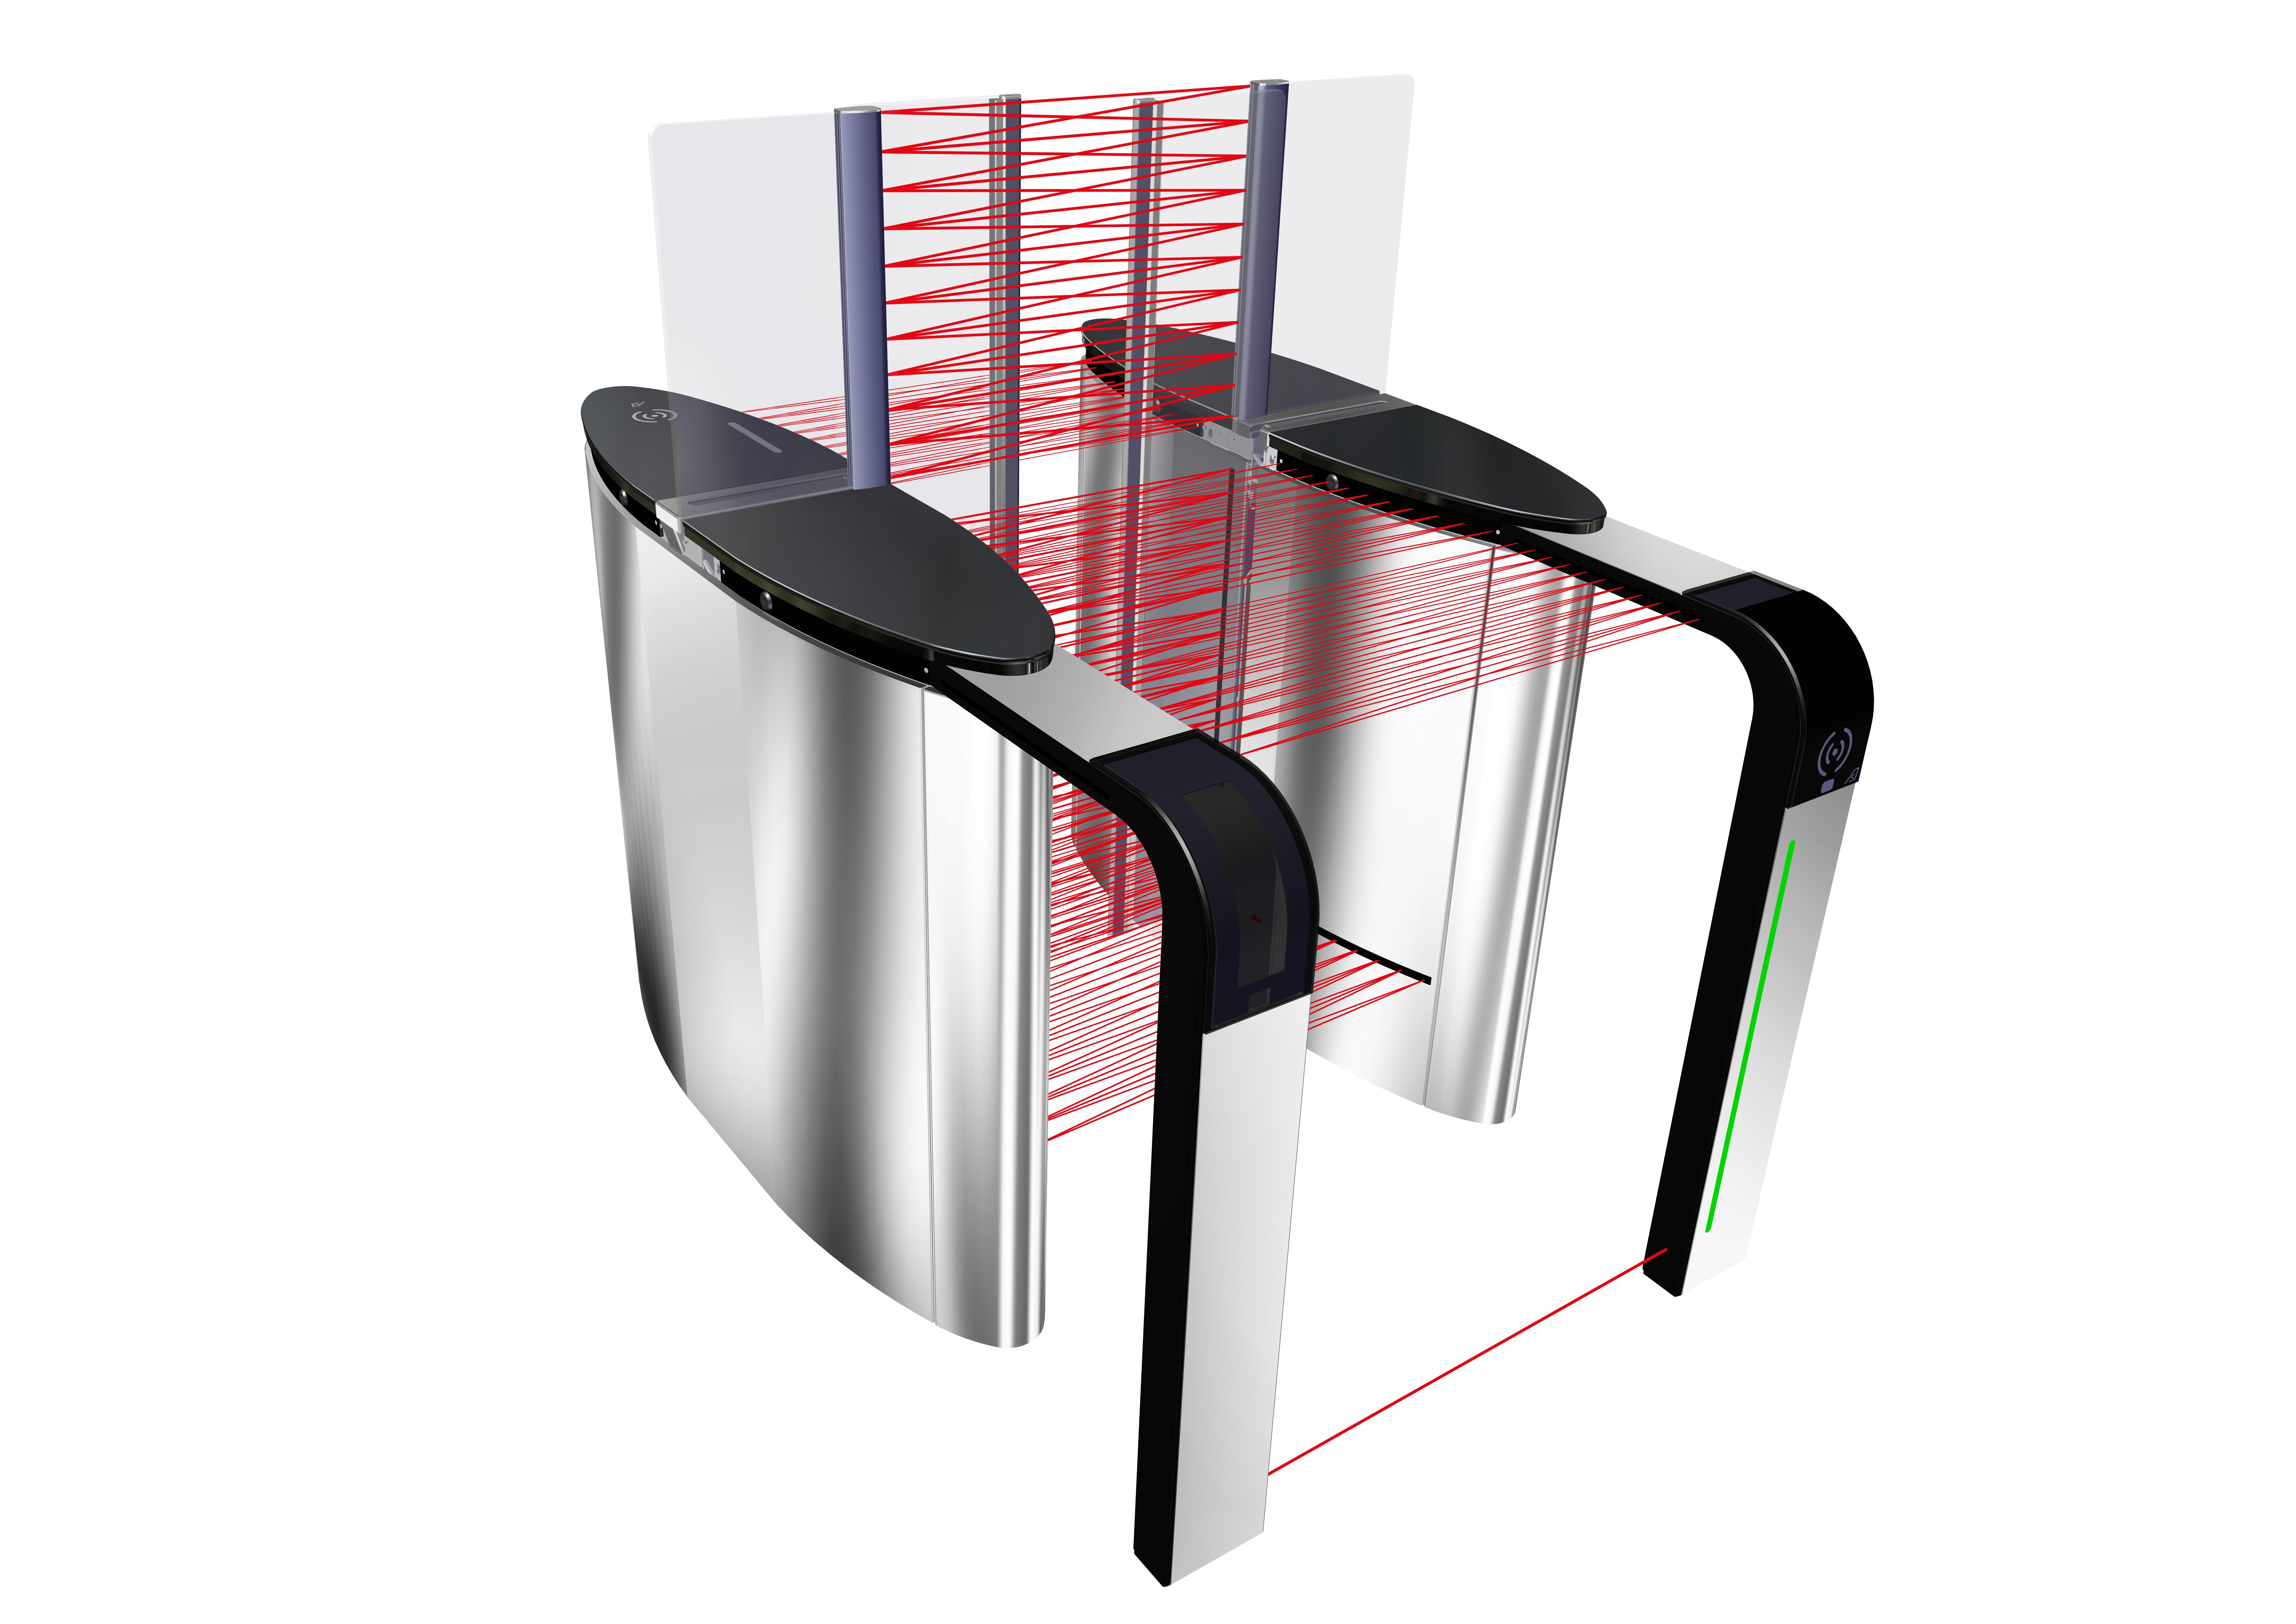 DIRAS fraud detection technology for speedgate and turnstile